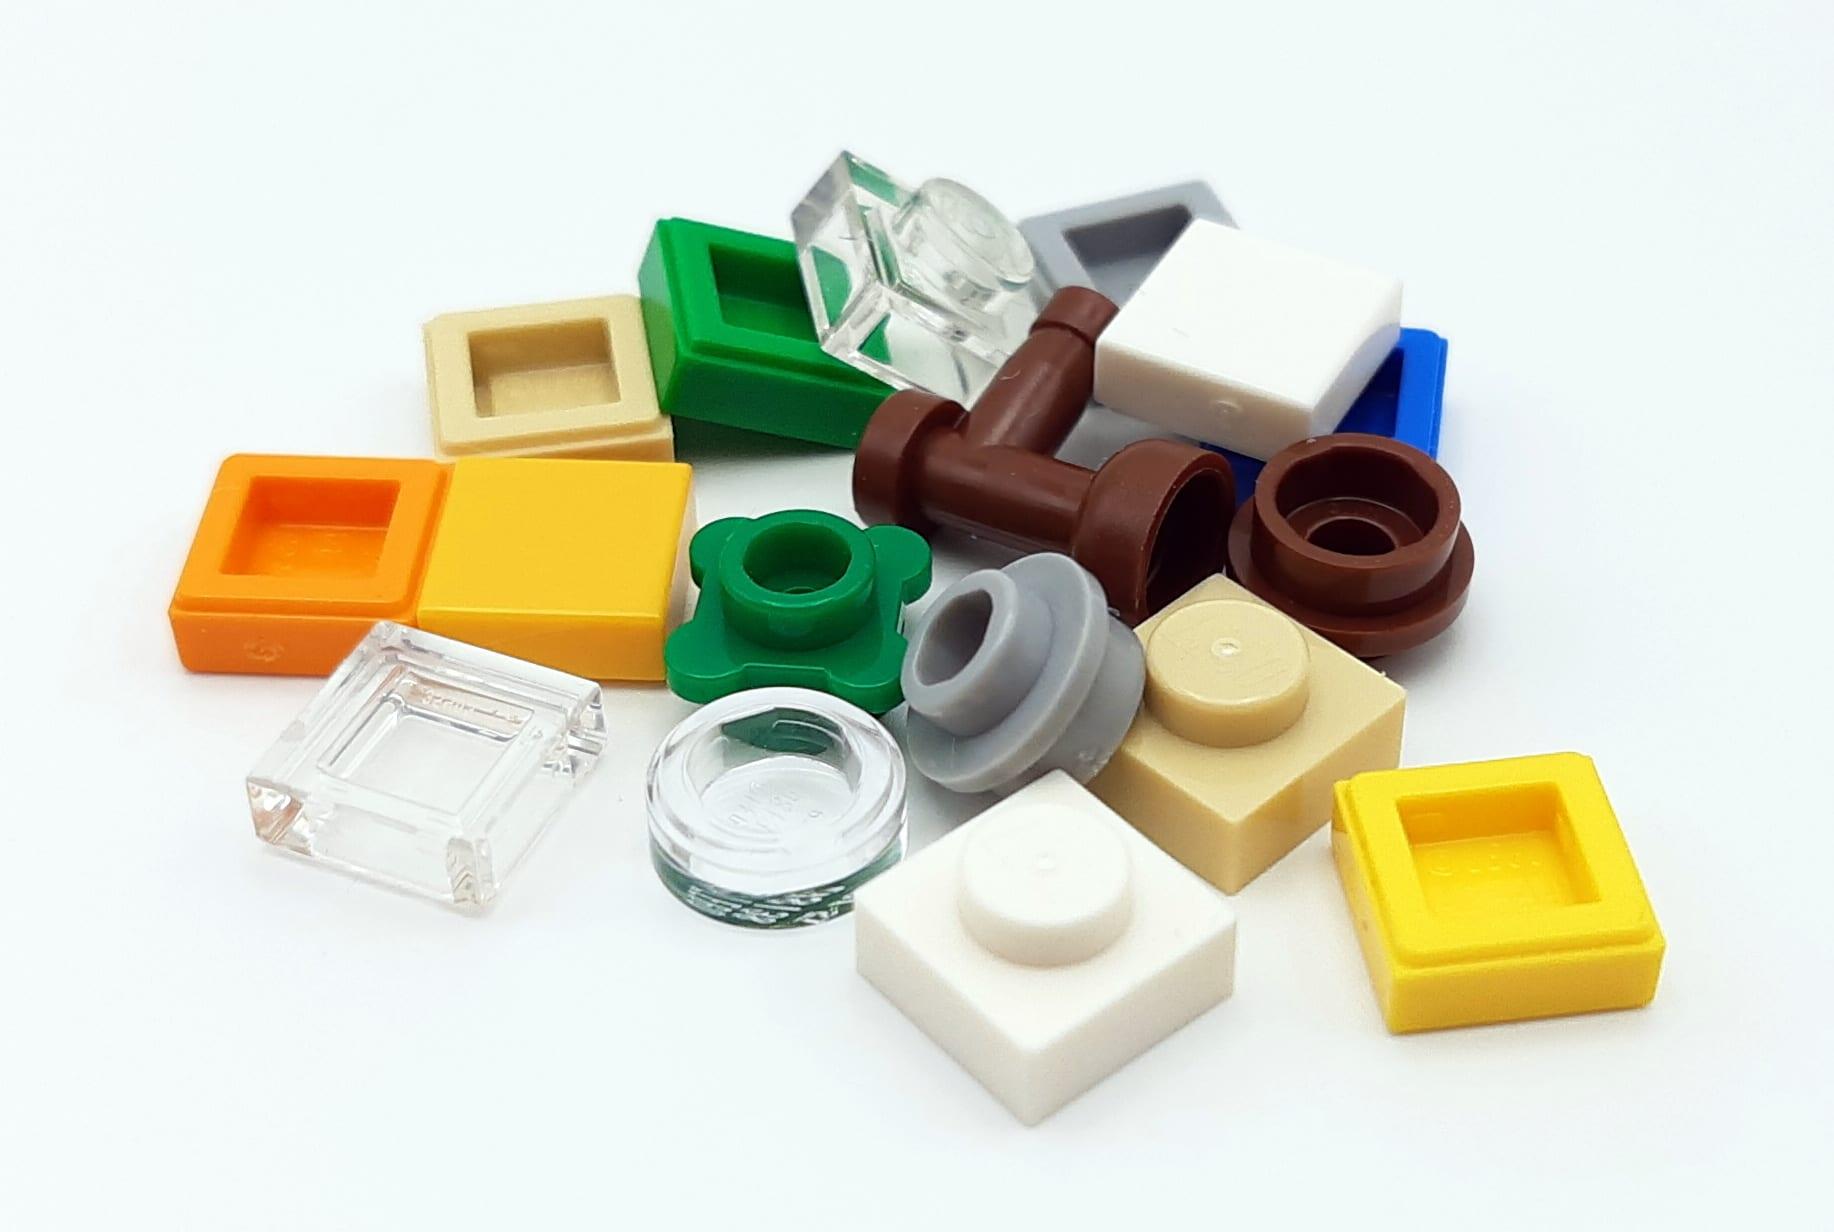 LEGO 21037 - LEGO House Ersatzteile